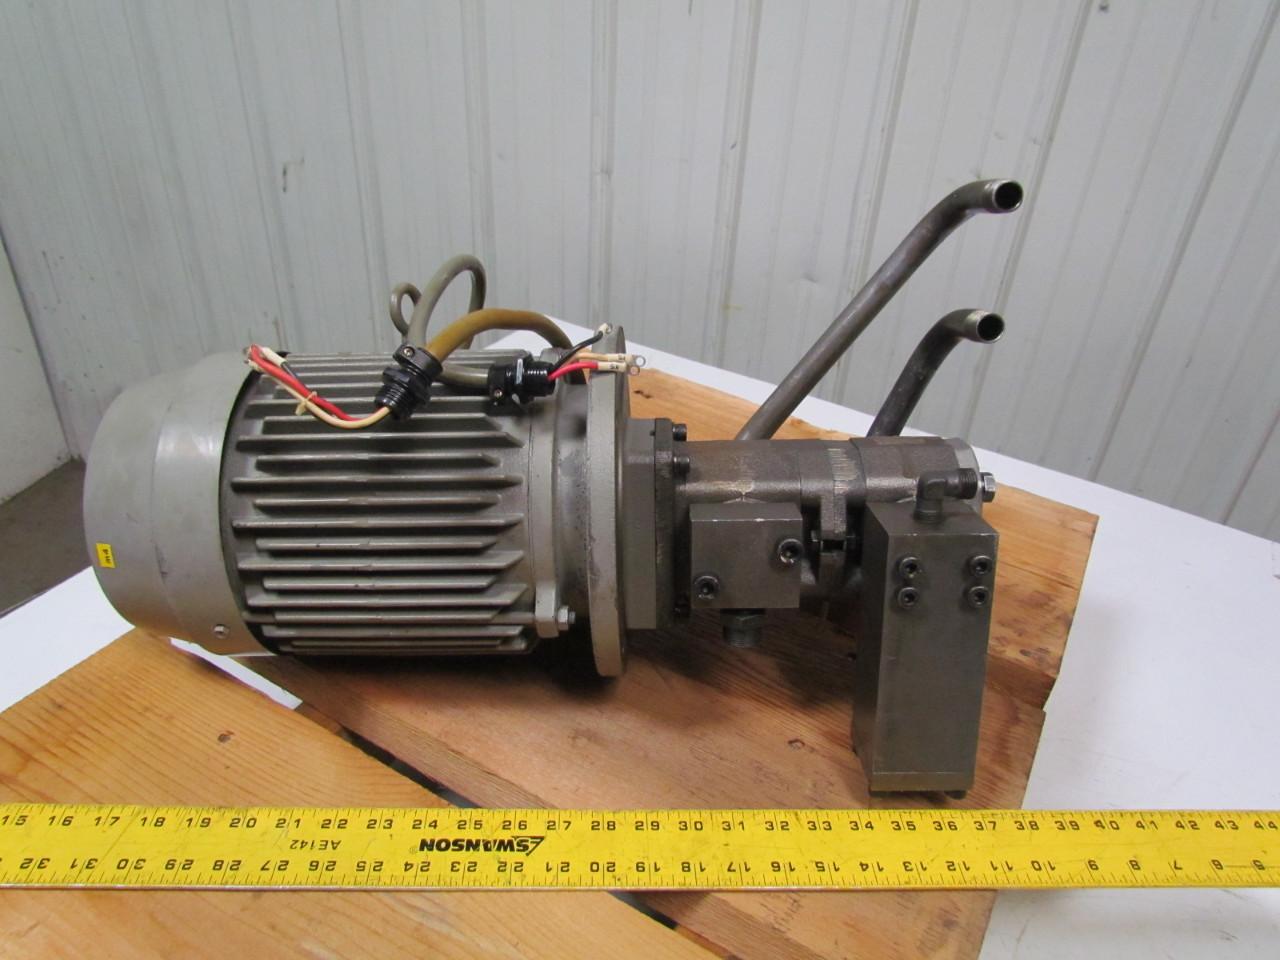 Bomba hidr ulica uchida gsp gsp2 aos12a 06ara0 901 0 for Hydraulic pump and motor combination